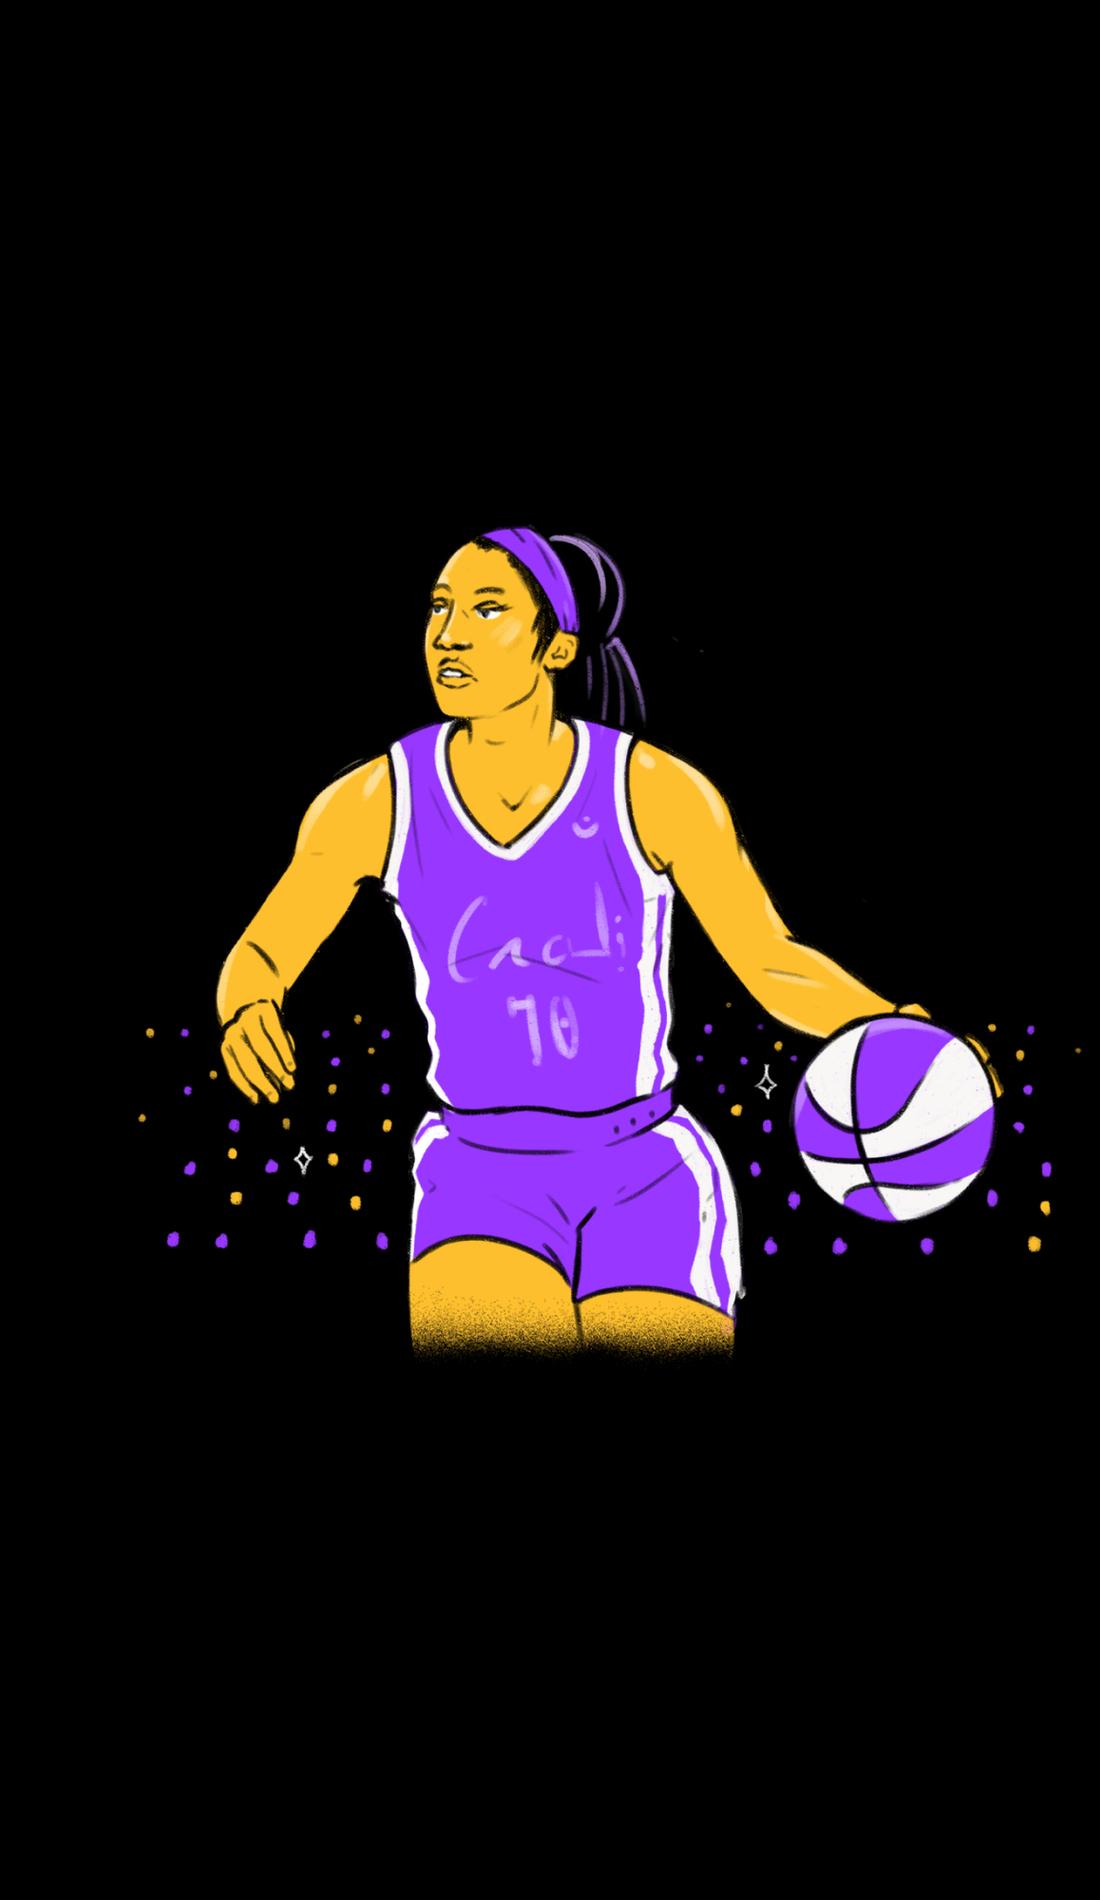 A Louisiana Ragin' Cajuns Womens Basketball live event